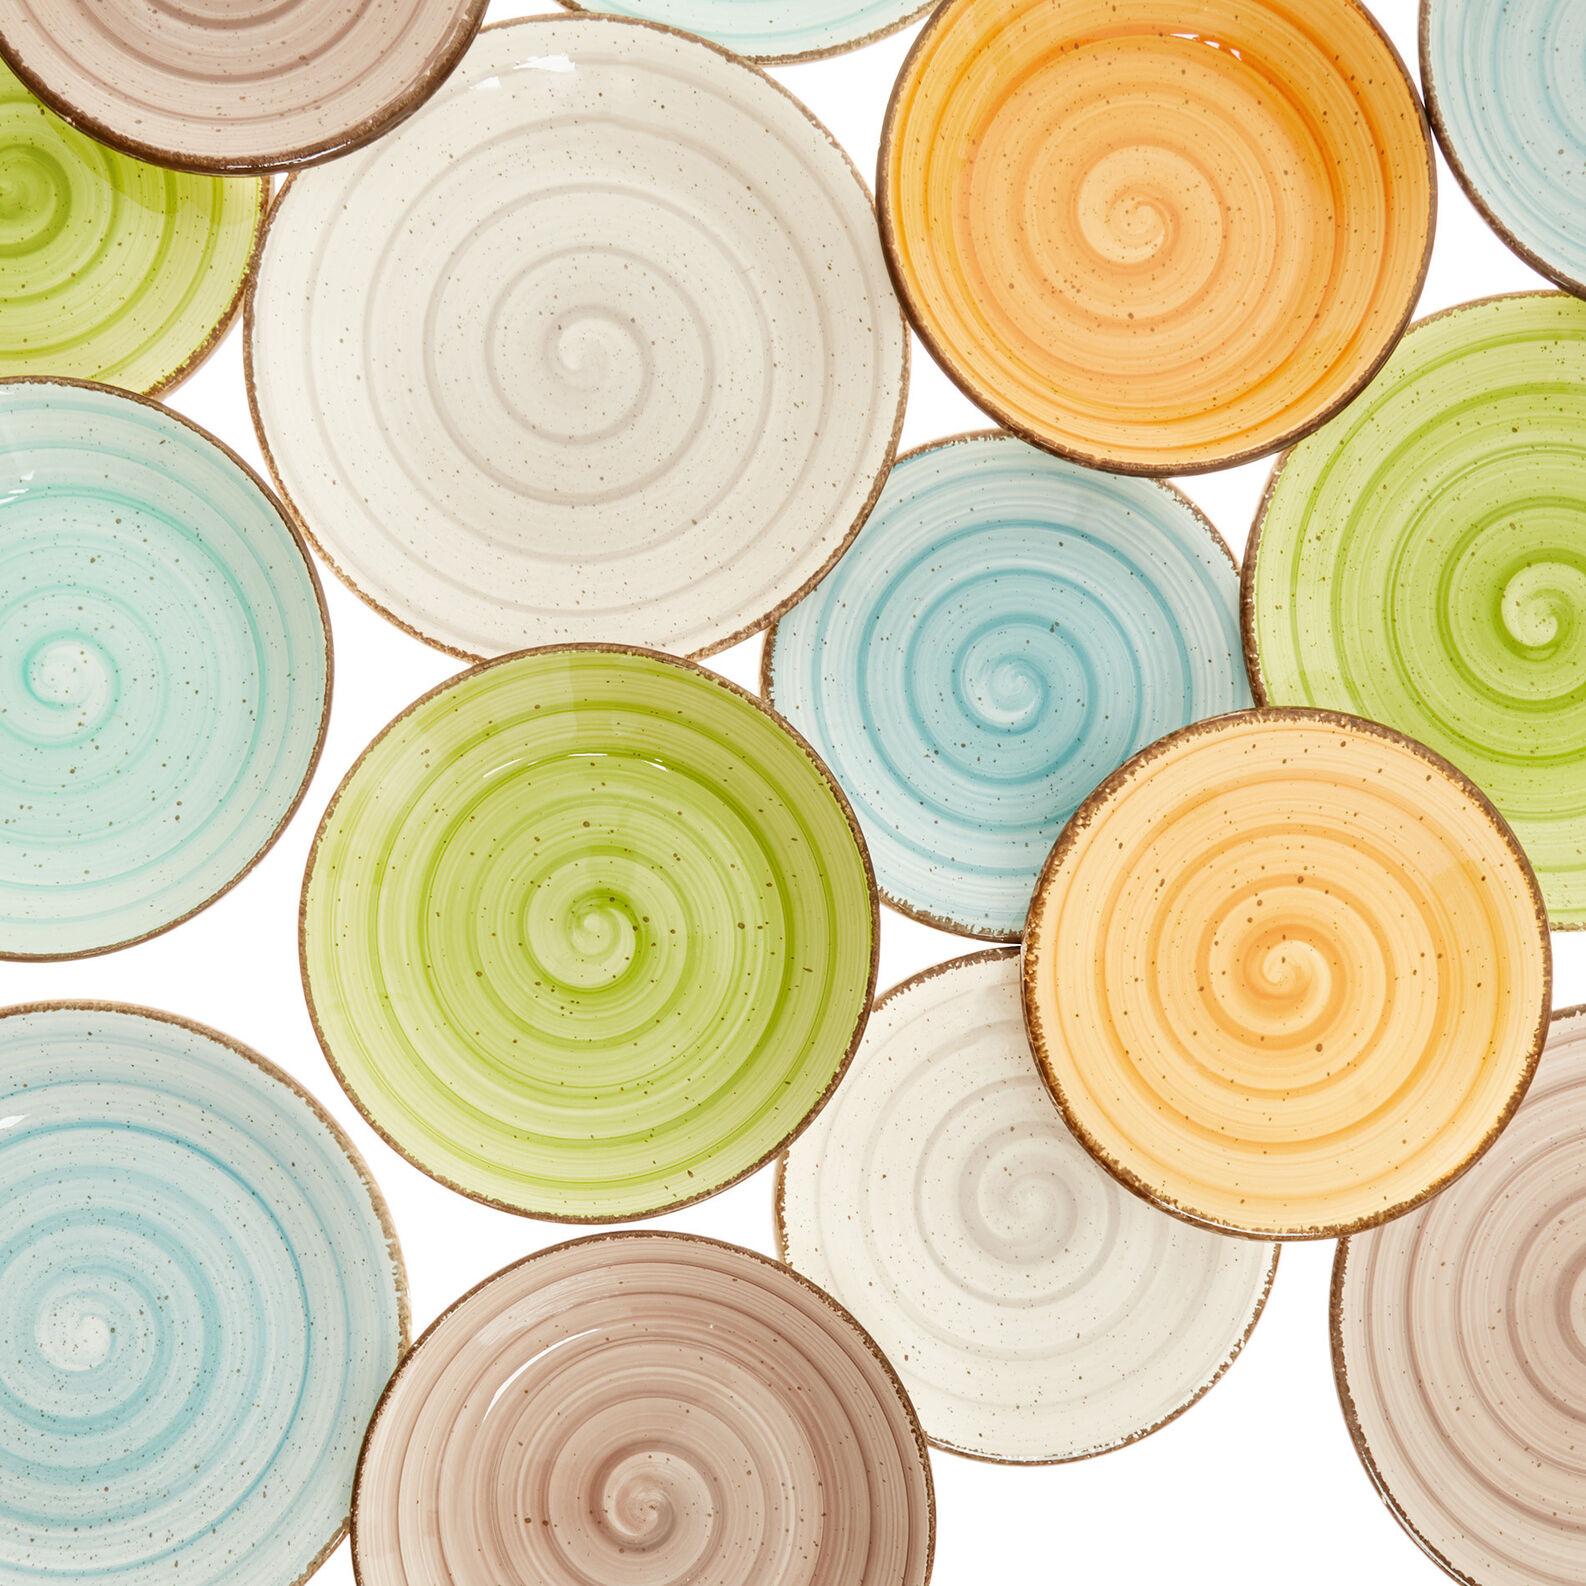 Giotto set of 18 coloured ceramic plates